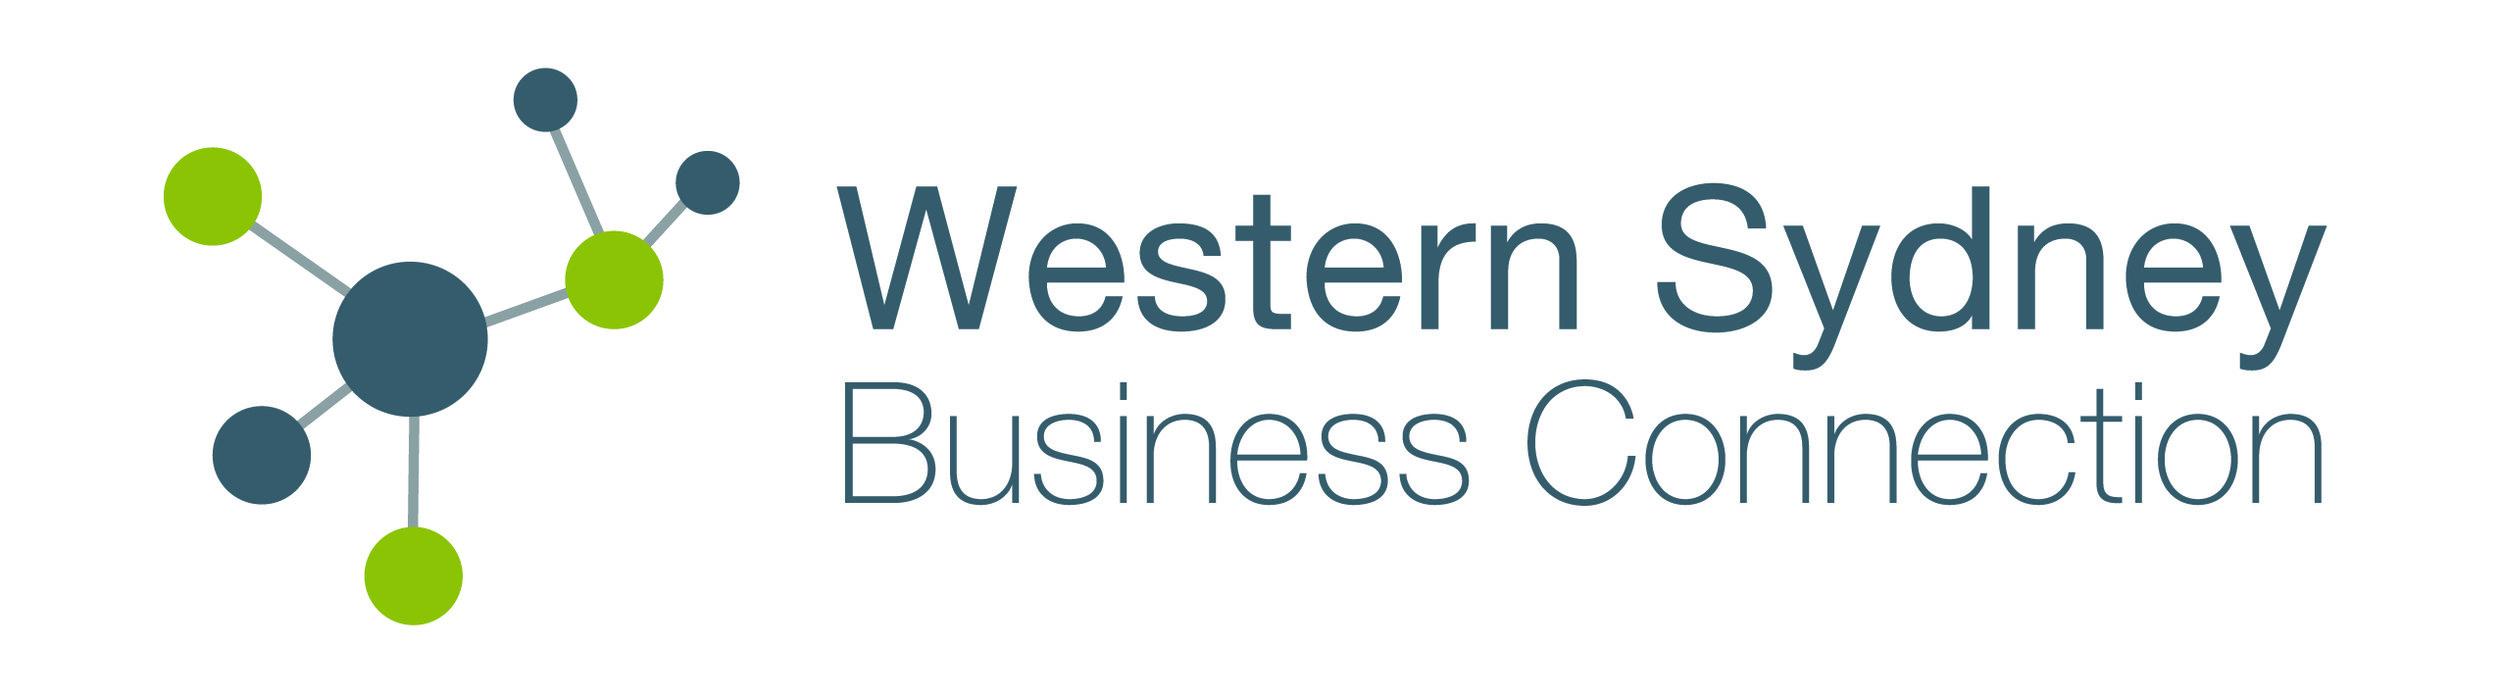 WSBC-logo-CMYK-01.jpg